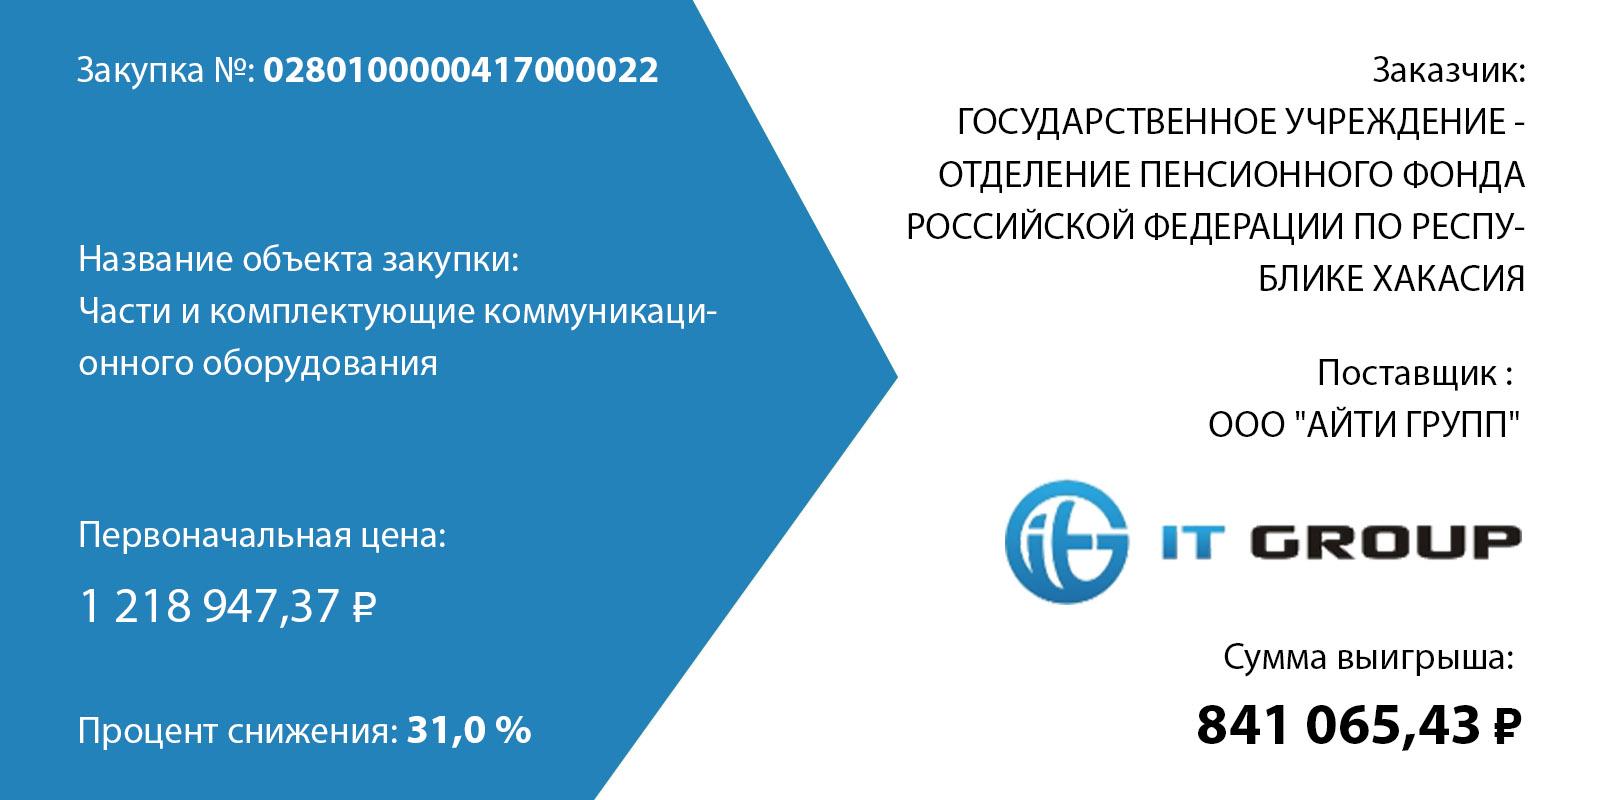 itgroup-841065